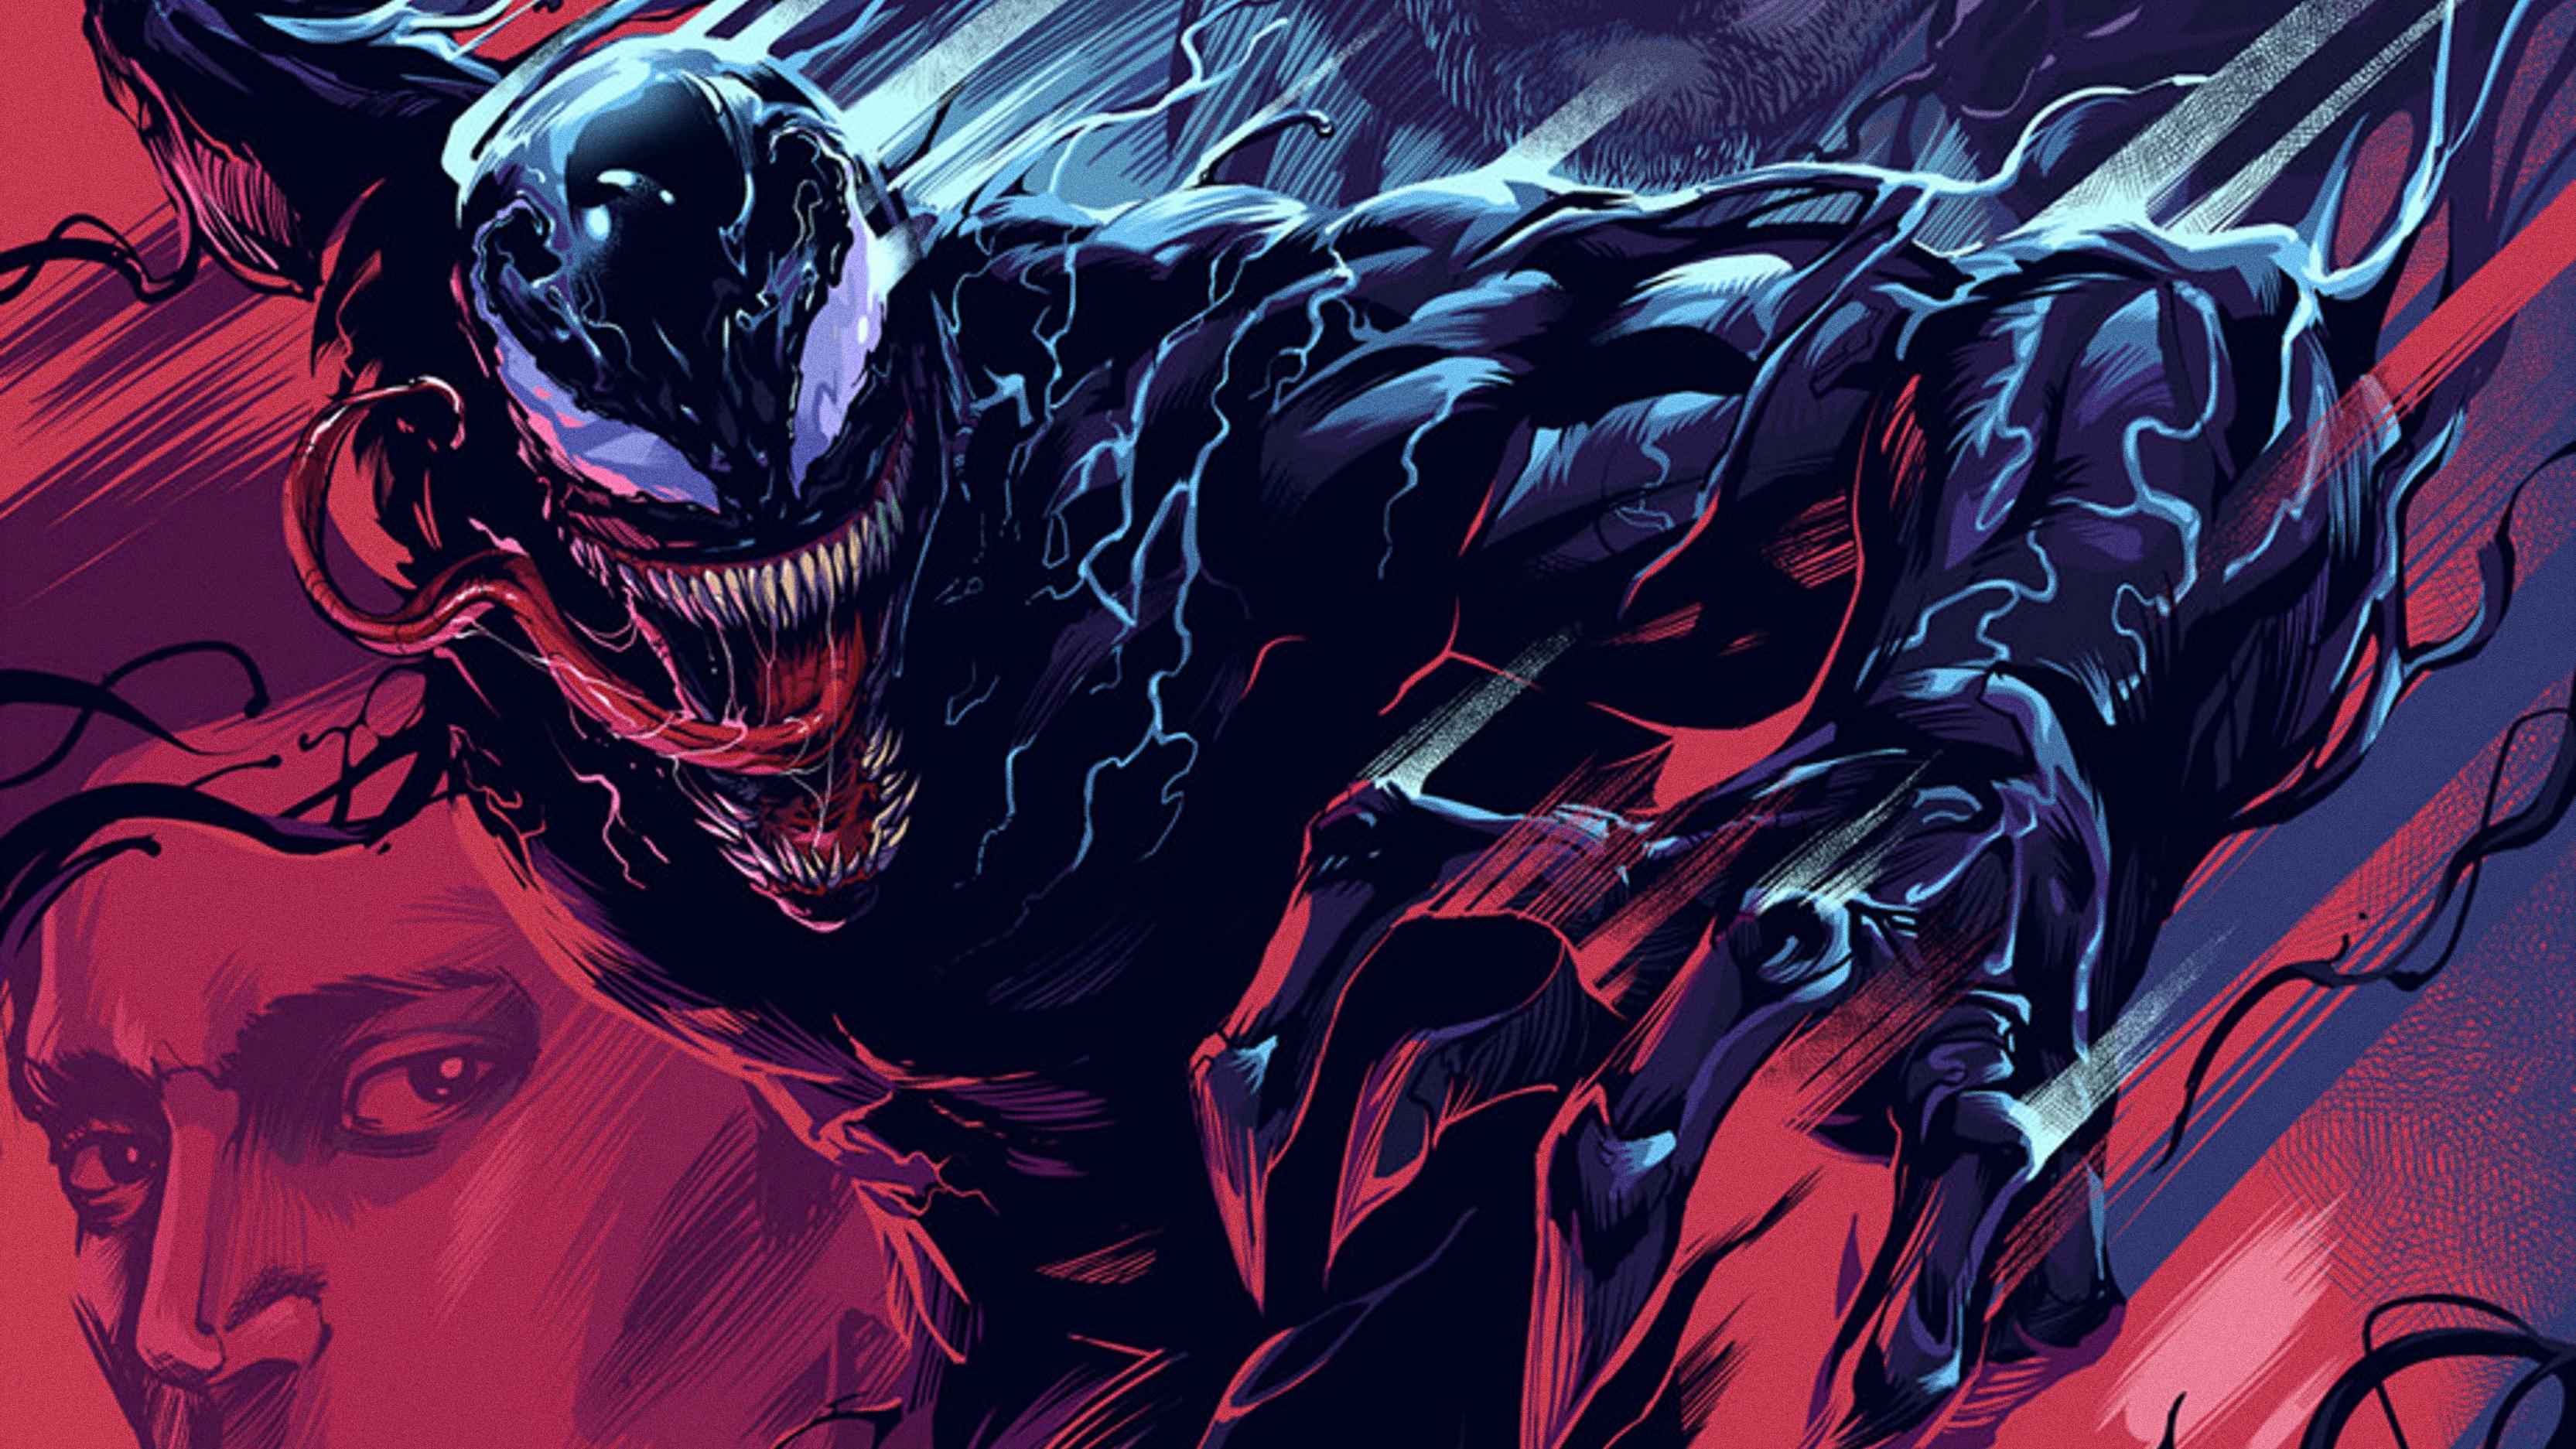 Venom artwork 4k 2018 hd superheroes 4k wallpapers - 4k wallpaper venom ...